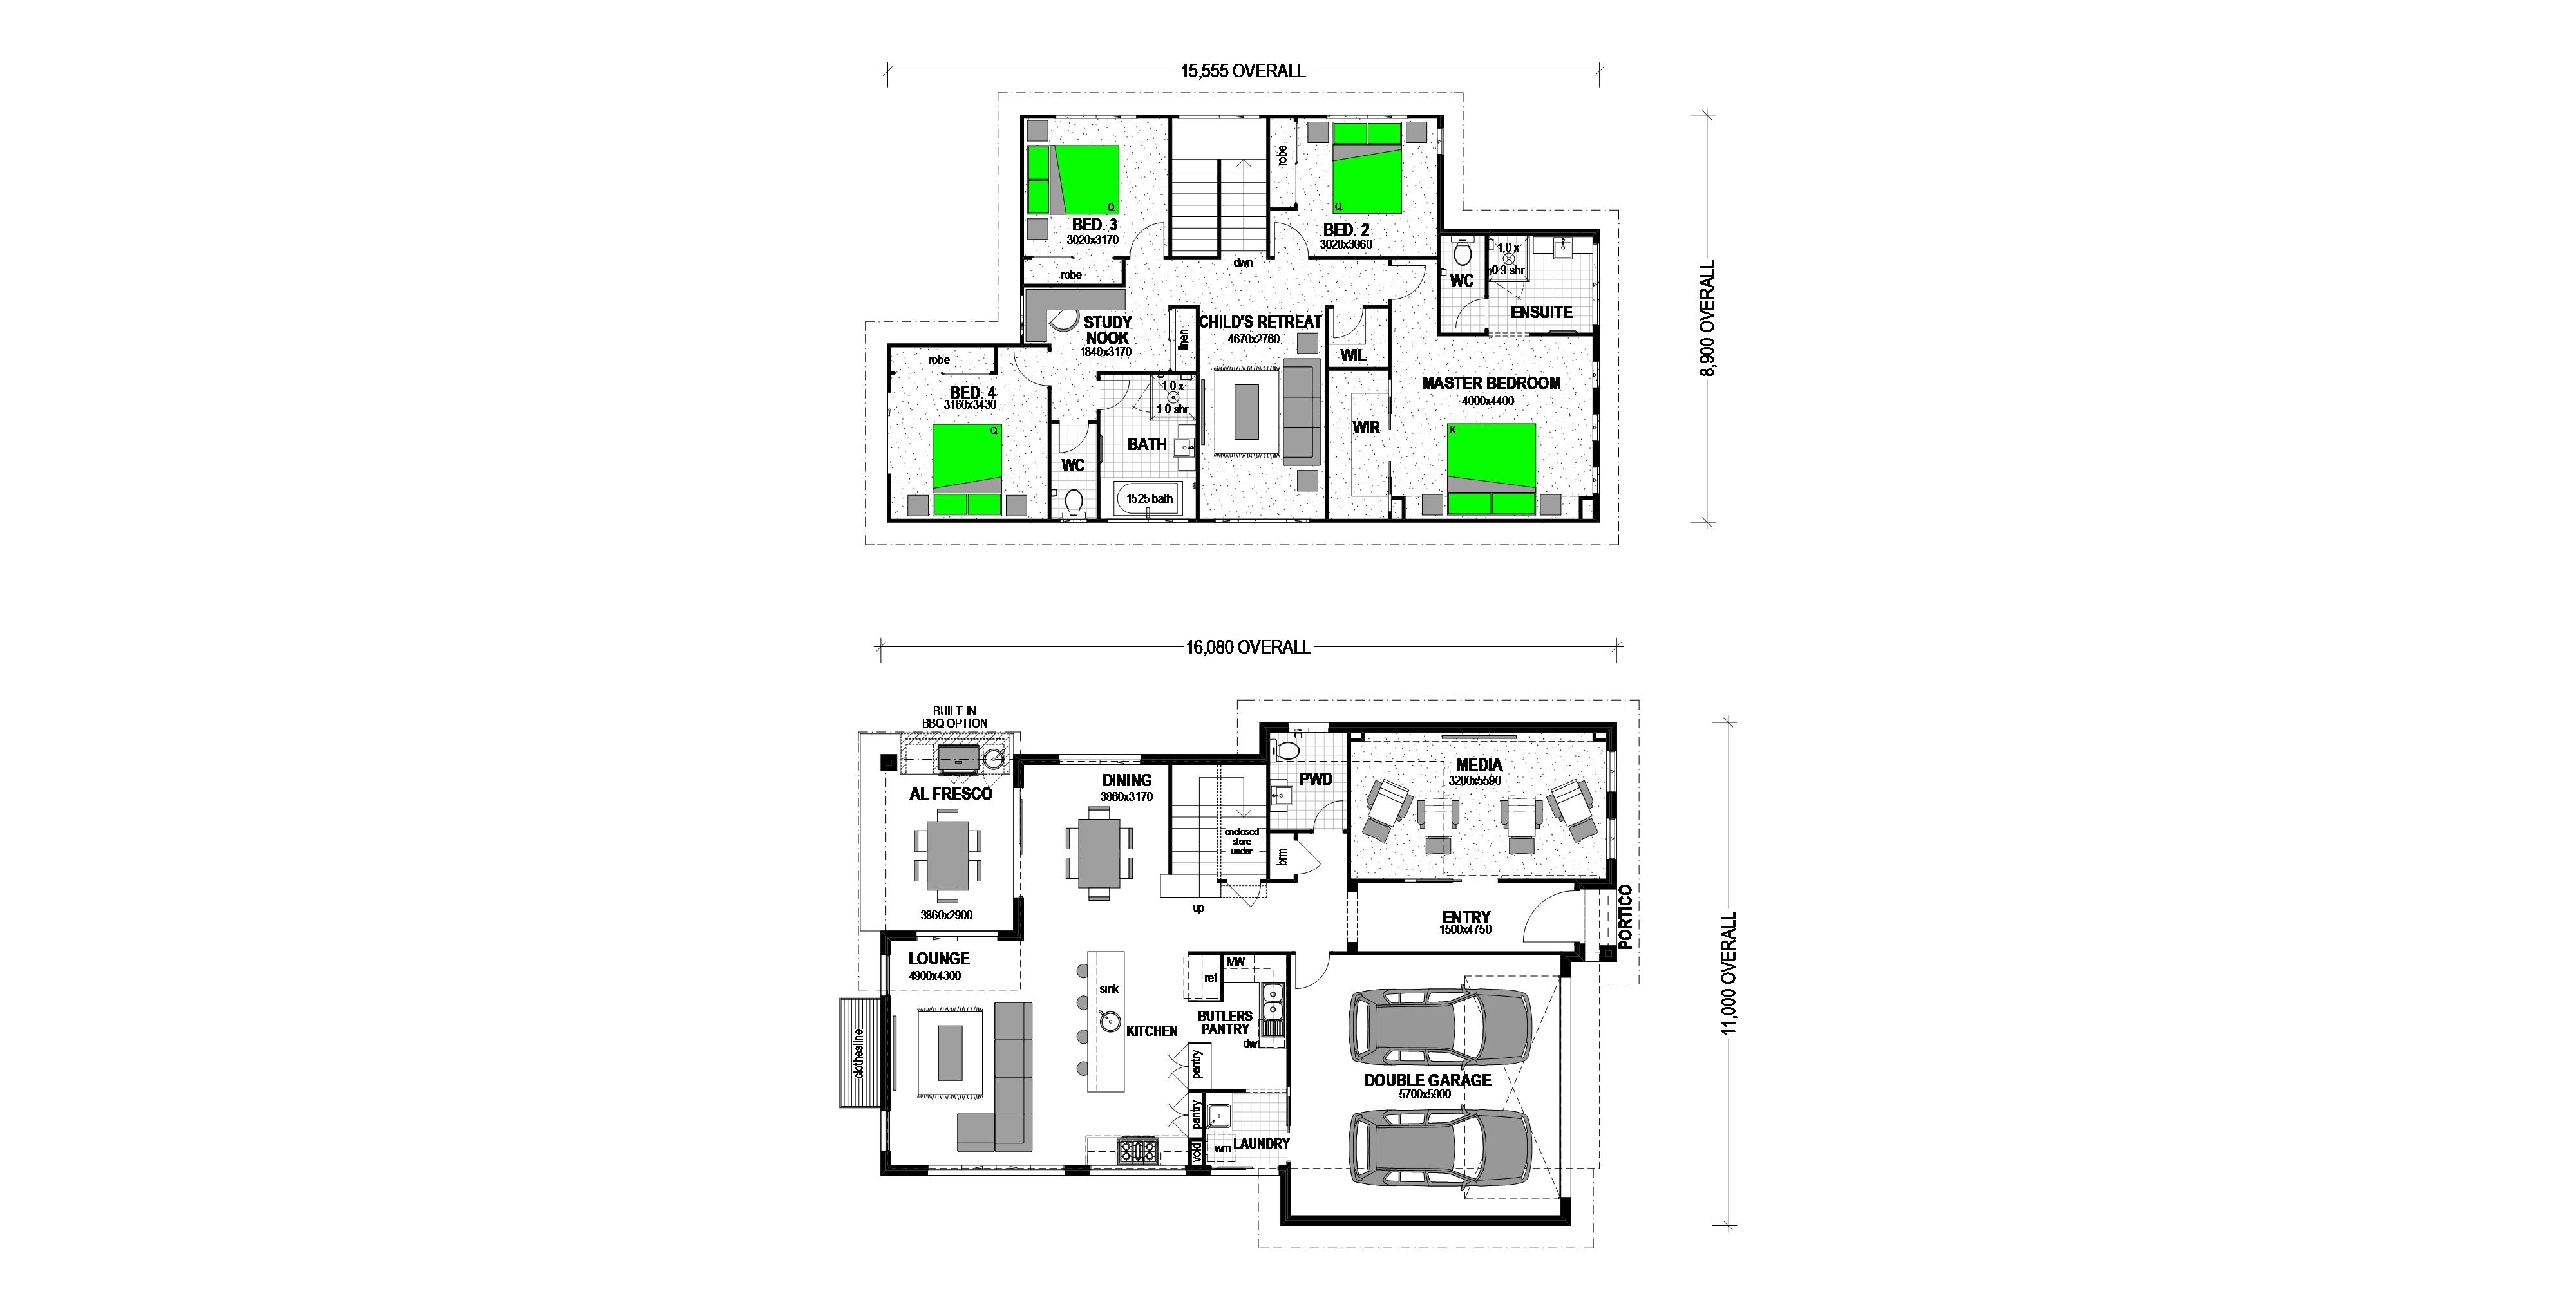 LOT 413 SOVEREIGN POCKET DEEBING HEIGHTS Floorplan